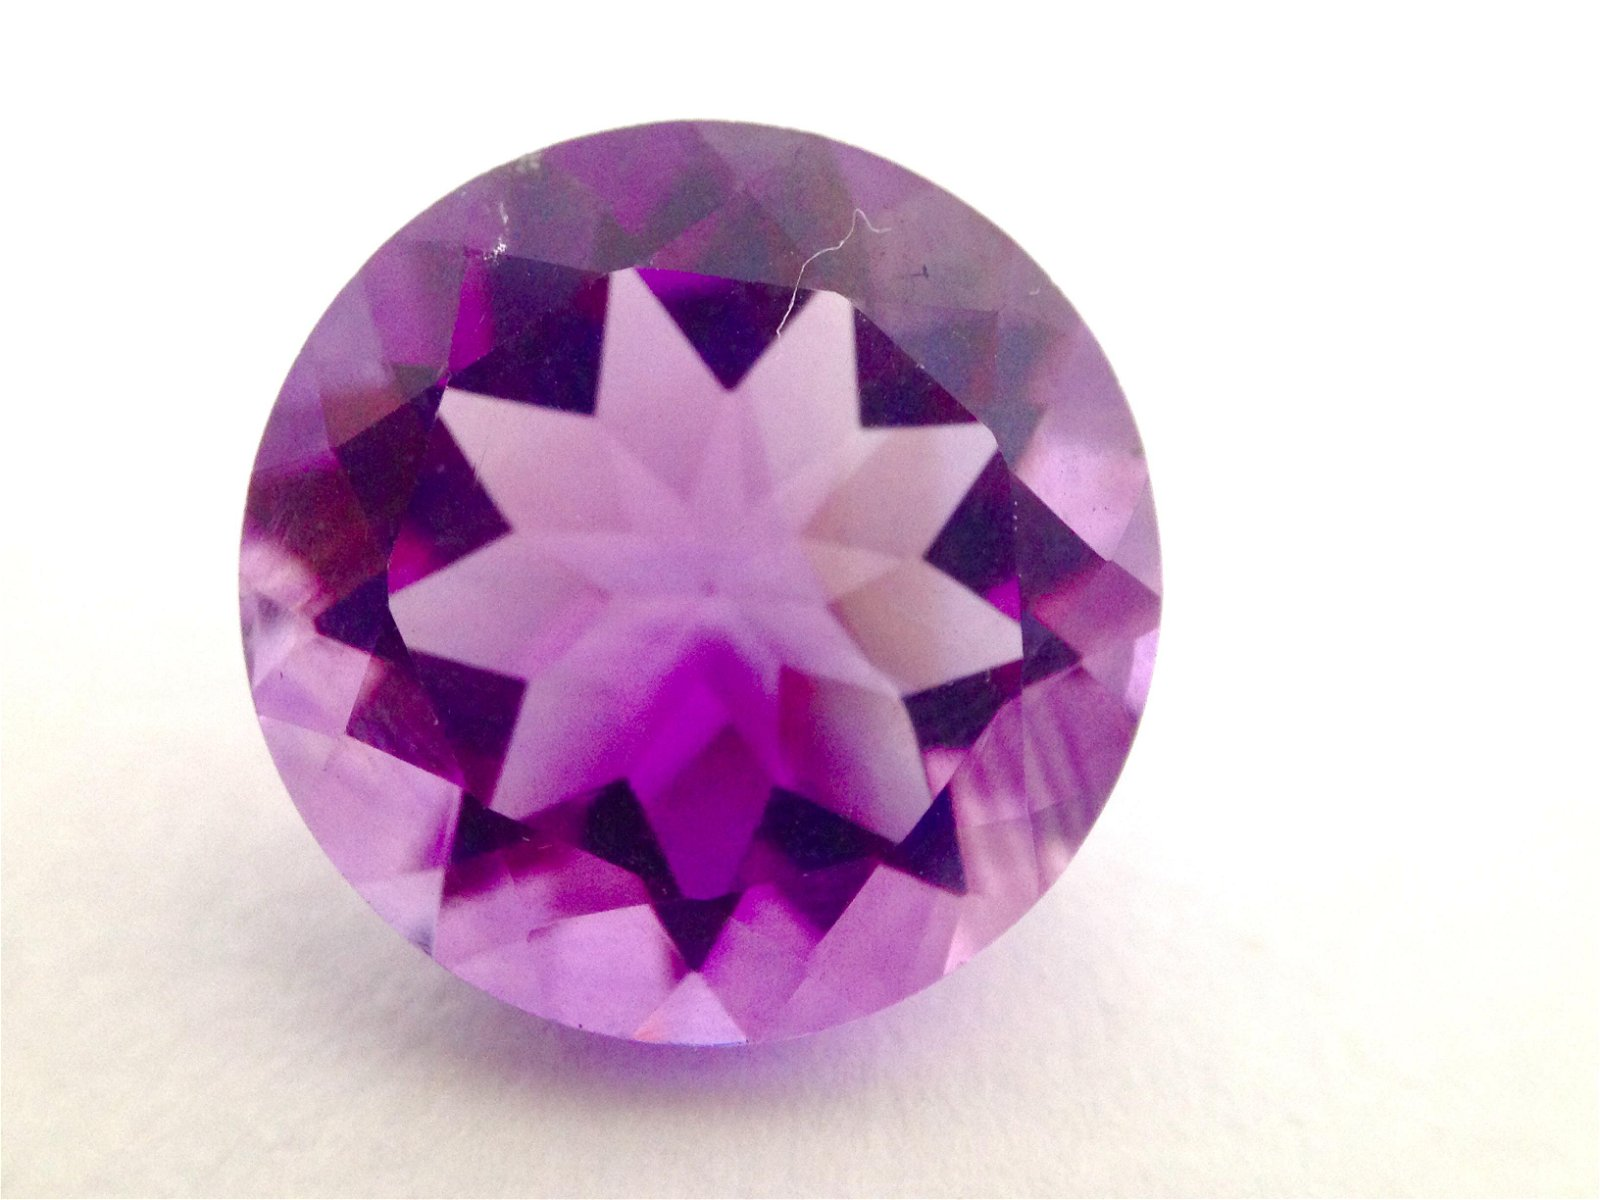 7.95ct Amethyst Loose Gemstone. AAA quality, round cut